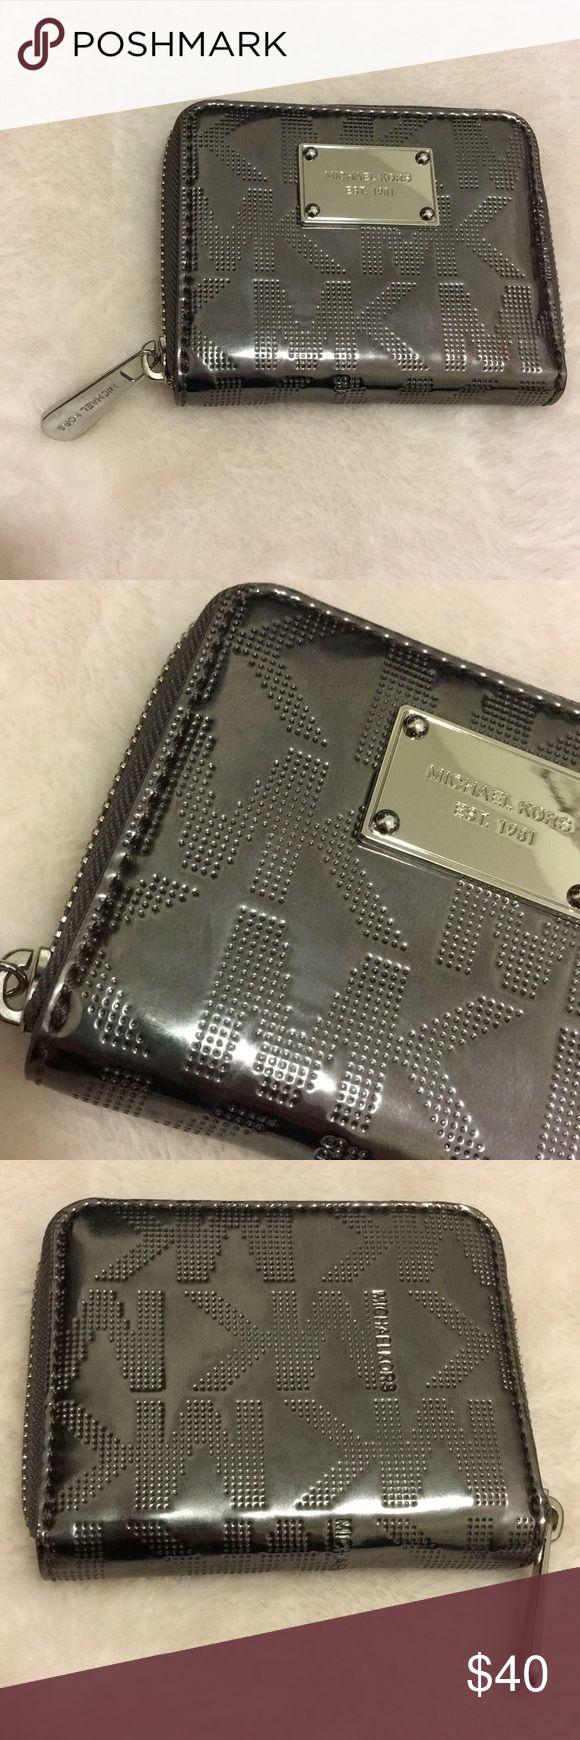 Michael Kors Jet Set Bi-Fold Zip Wallet Michael Kors Jet Set Zip Around Bi-Fold Wallet Dark Silver Color Michael Kors Bags Wallets